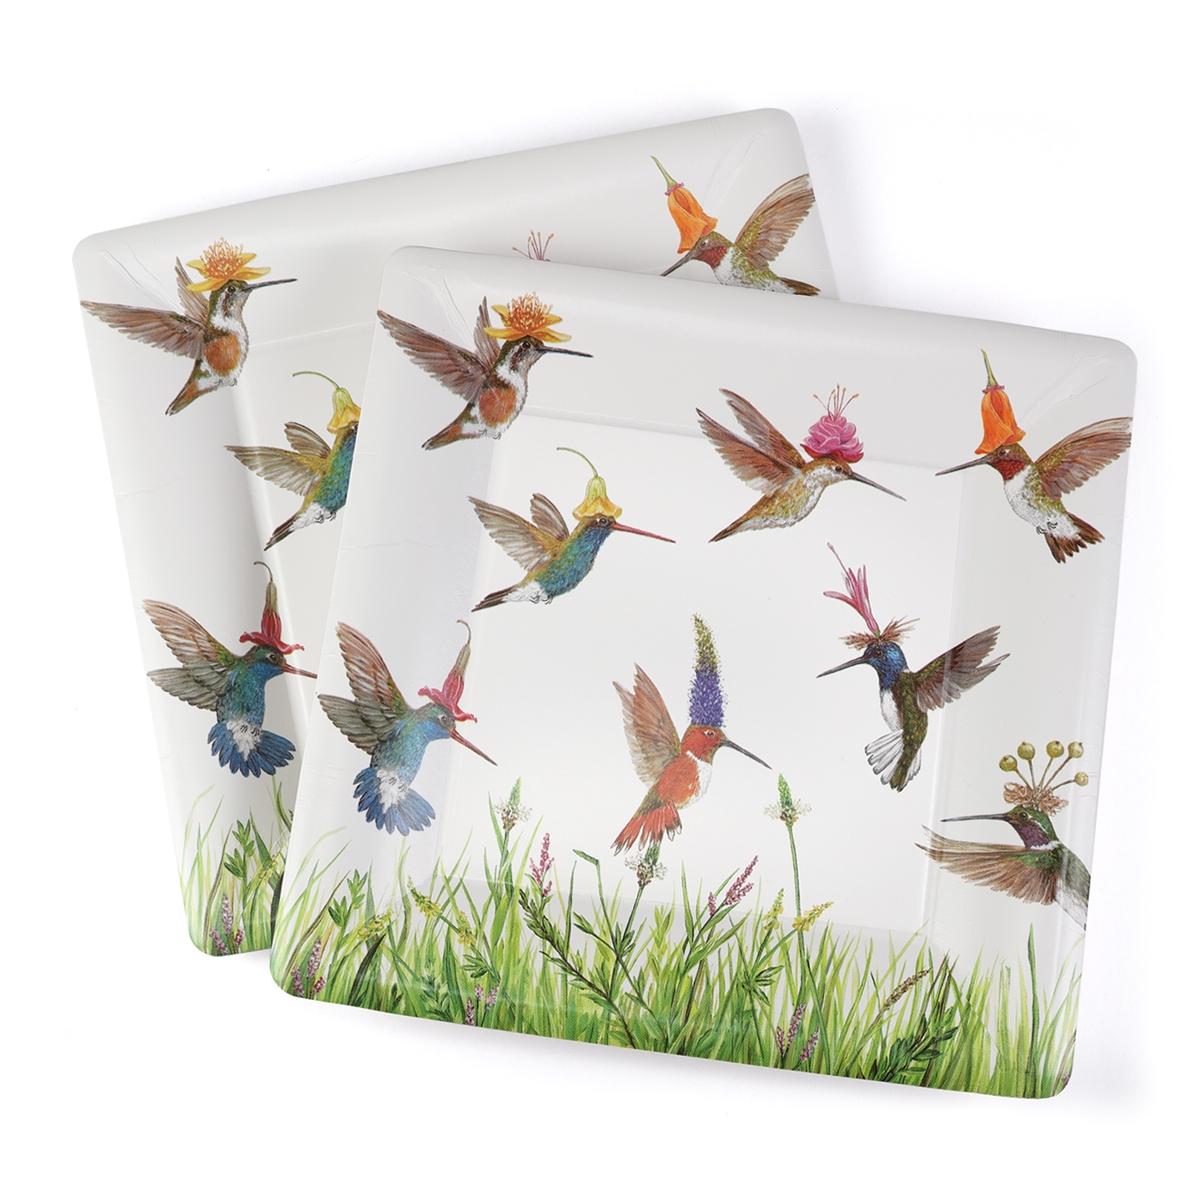 Hummingbird Frenzy Dinner Paper Plate